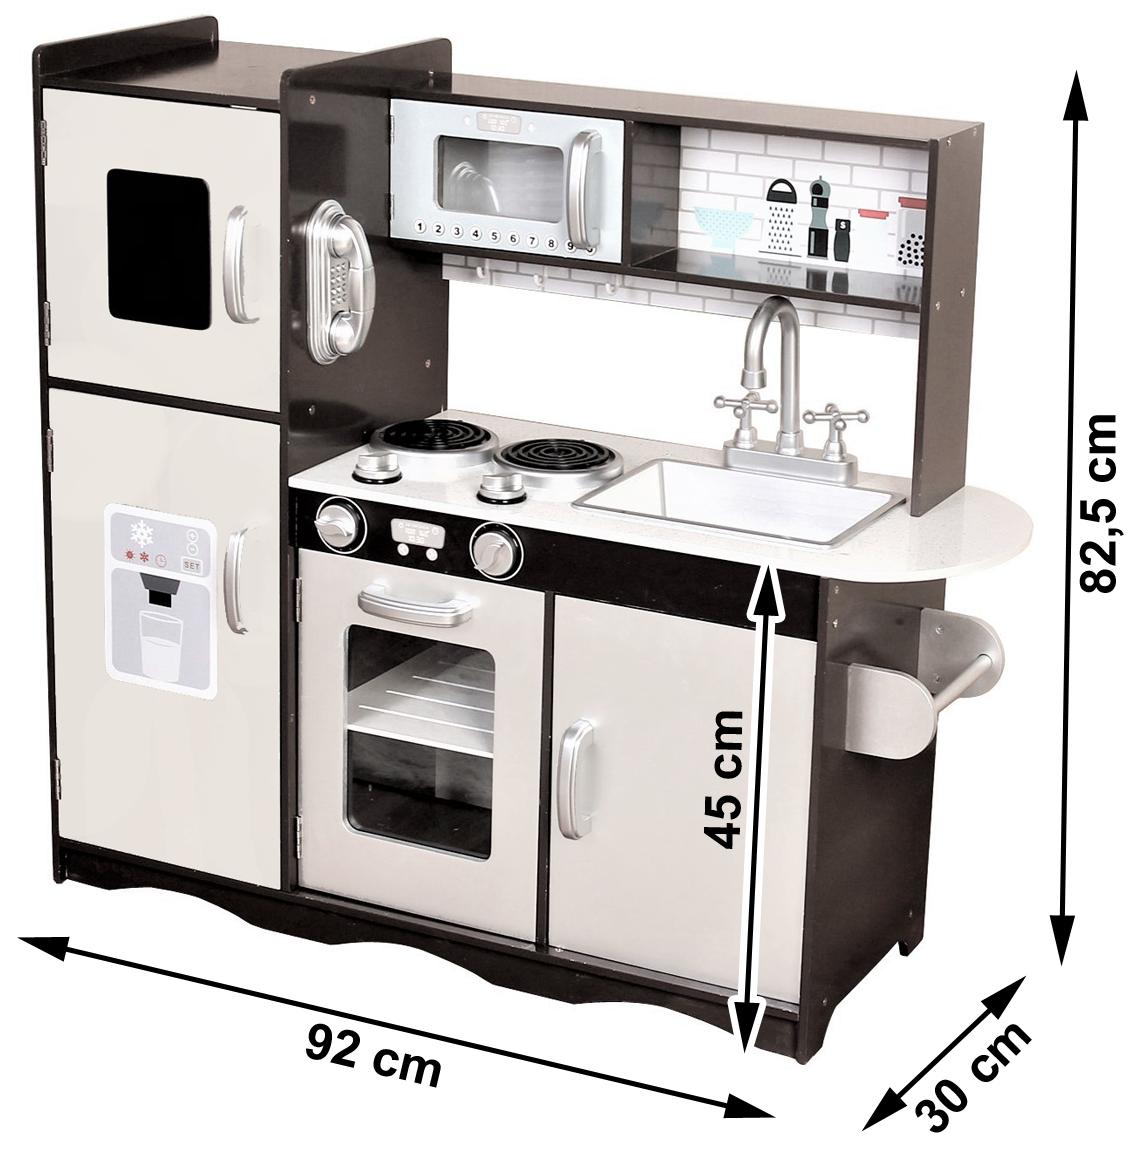 Drewniana Kuchnia Dla Dzieci Oven Kitchen Kitchen Appliances